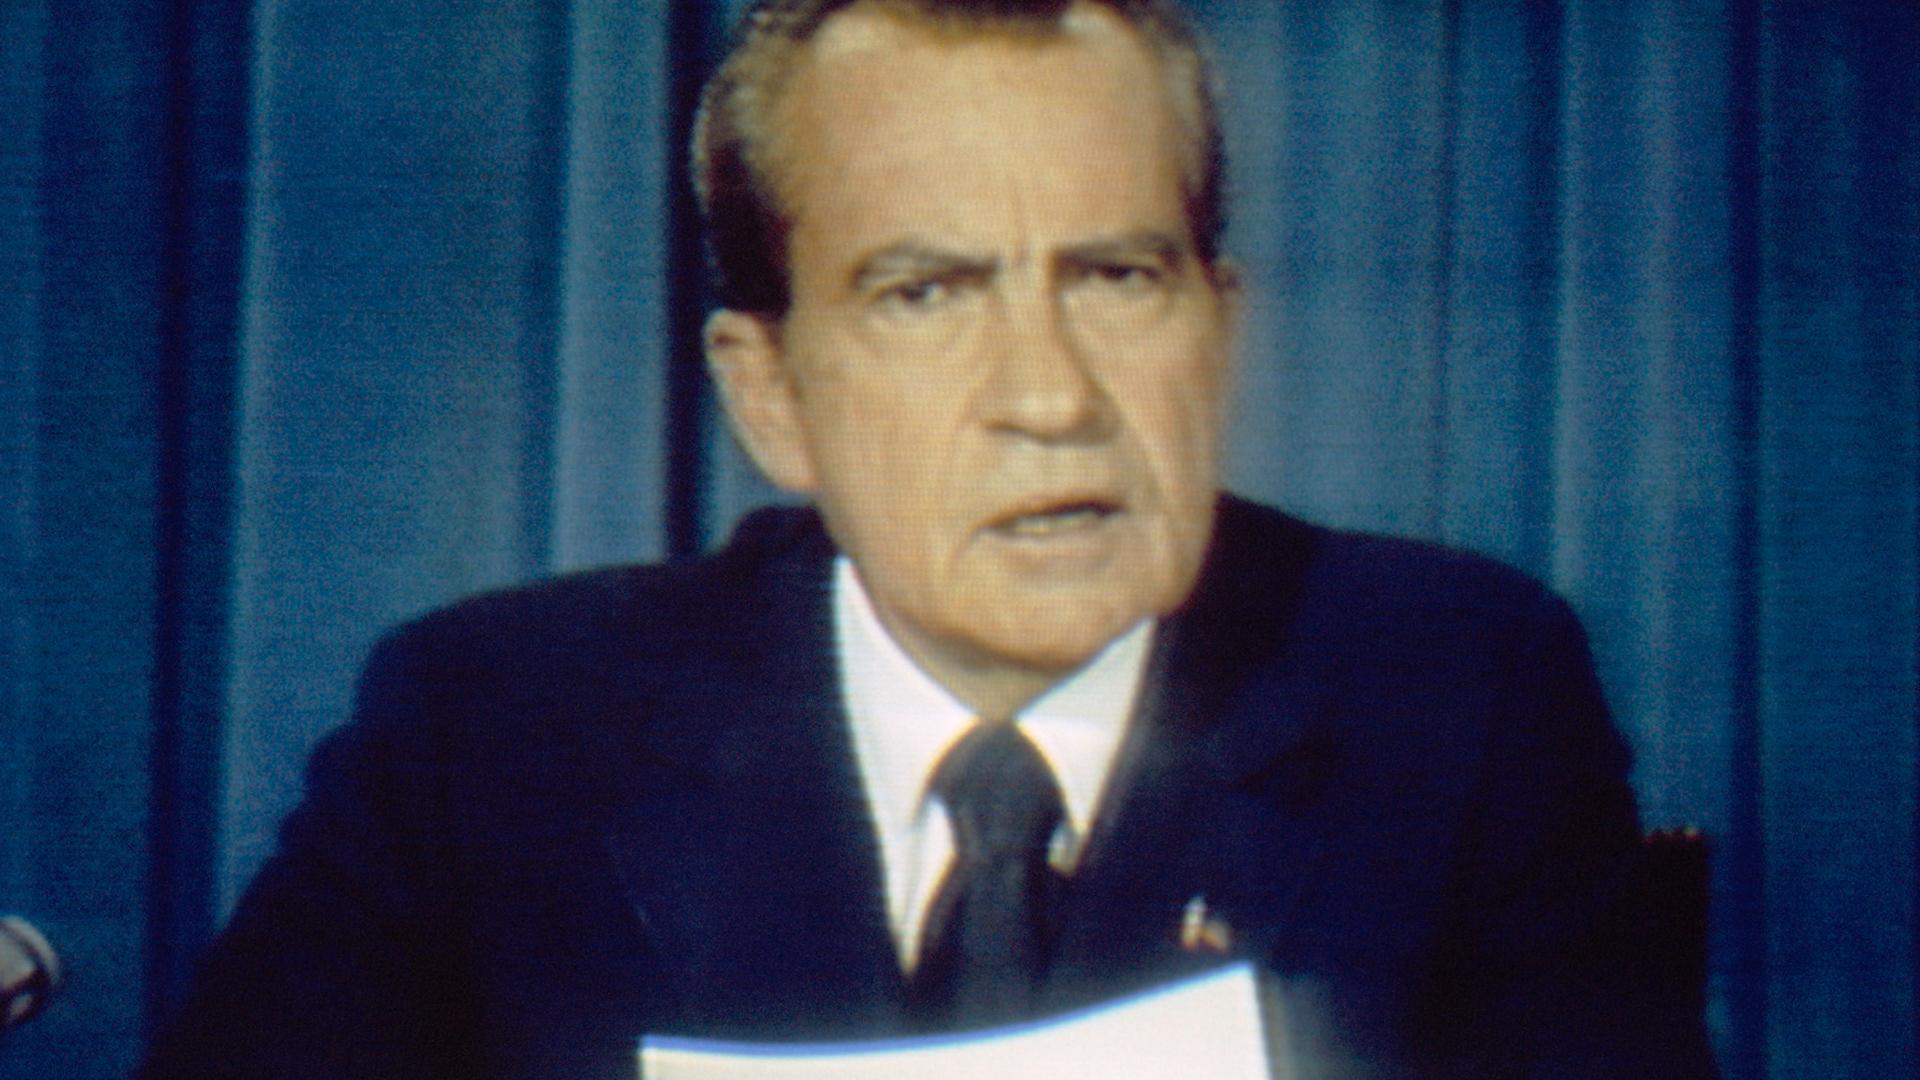 Richard-Nixon_Resignation-Speech_HD.jpg